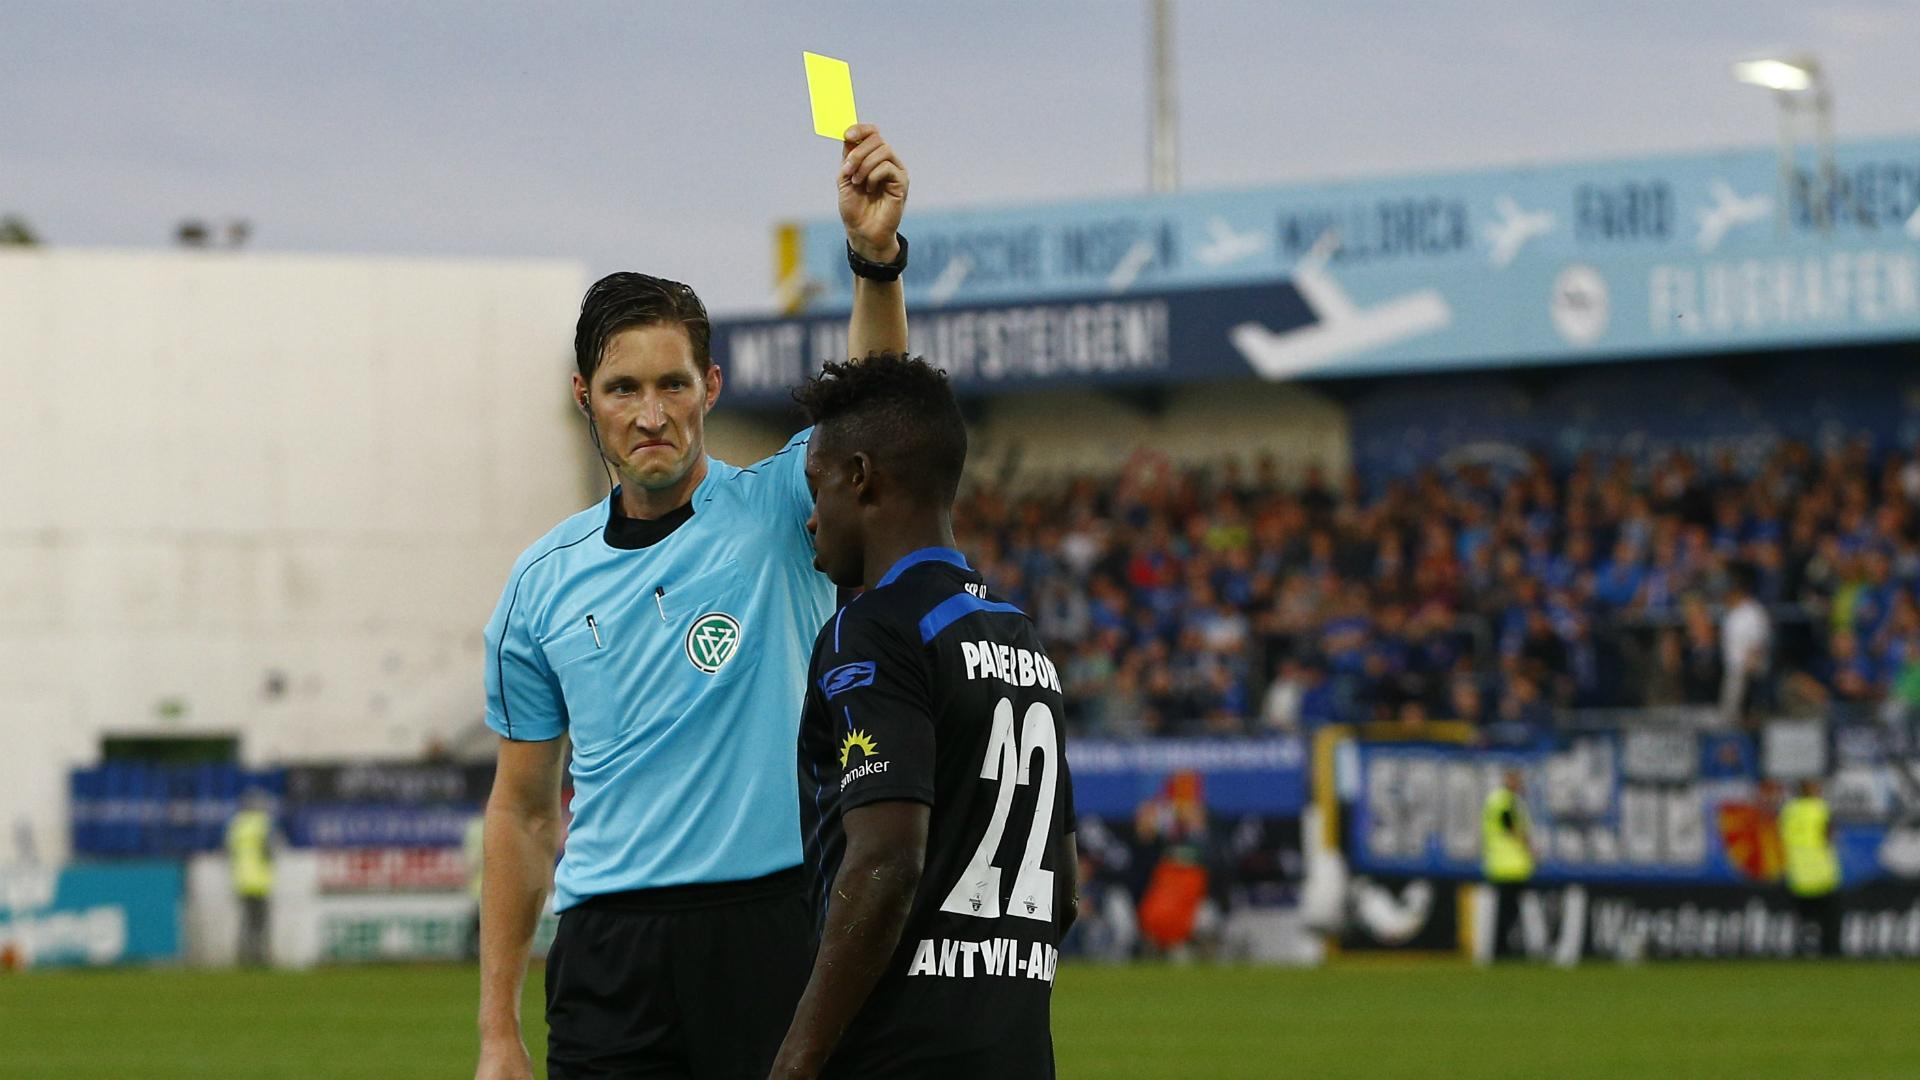 Ghana midfielder Antwi-Adjei receives first career red card in Paderborn draw